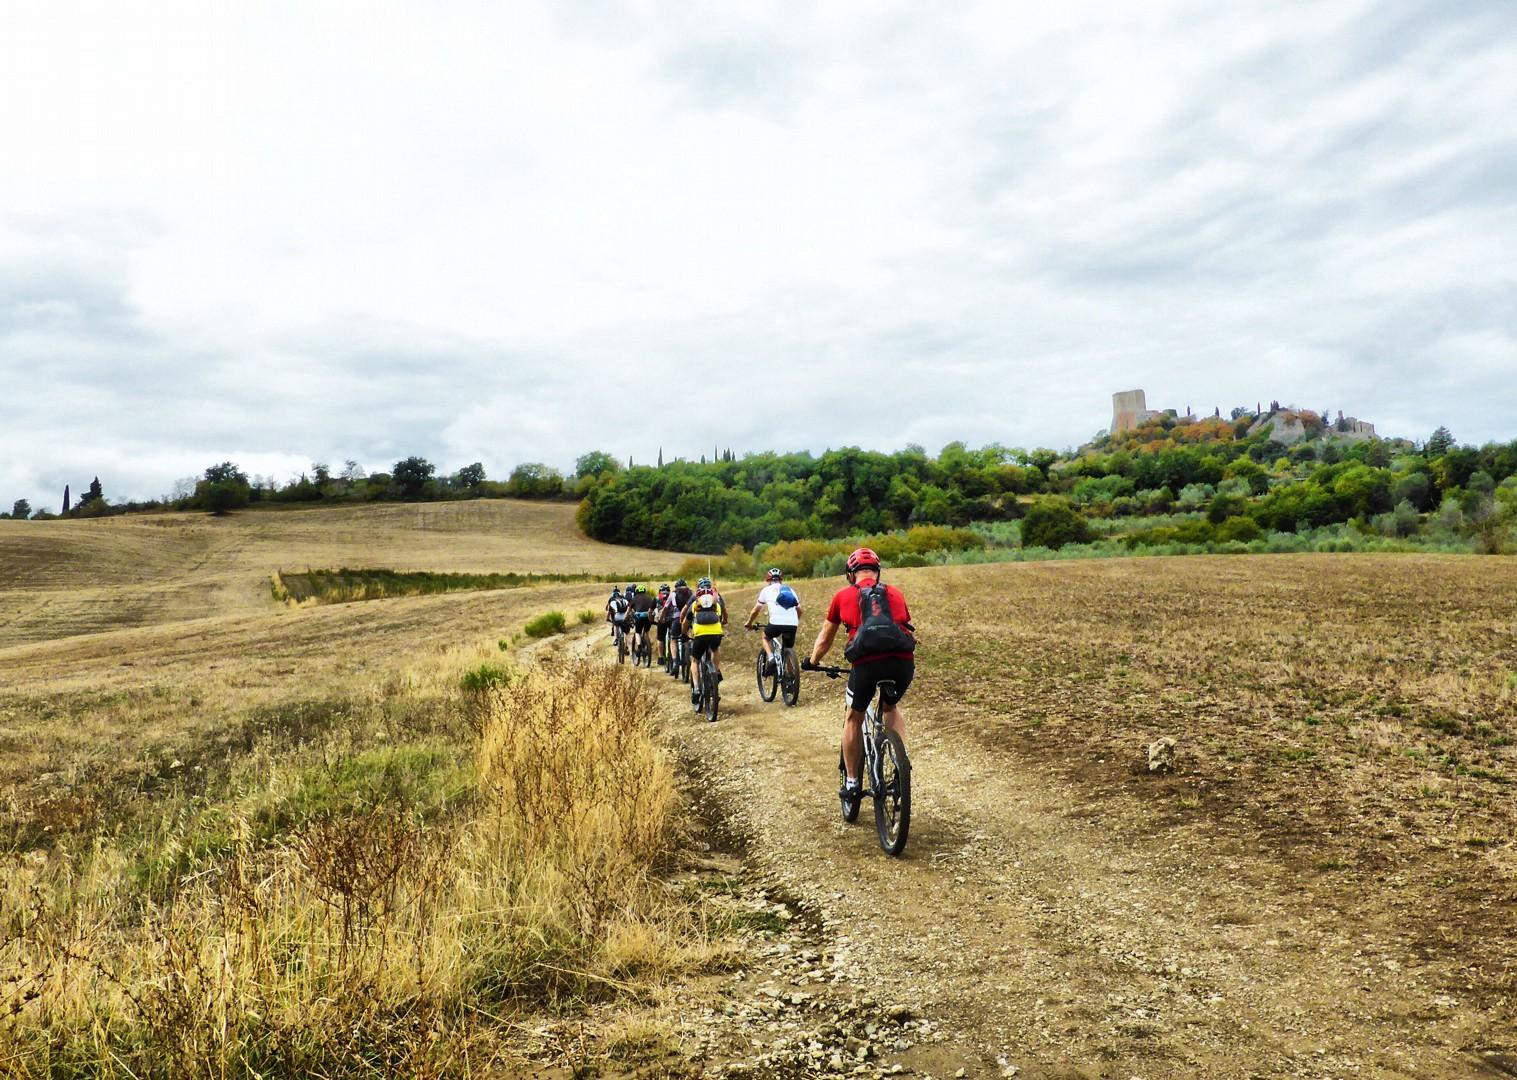 Foto 11-09-17, 10 53 50.jpg - Italy - Via Francigena (Tuscany to Rome) - Guided Mountain Biking Holiday - Mountain Biking